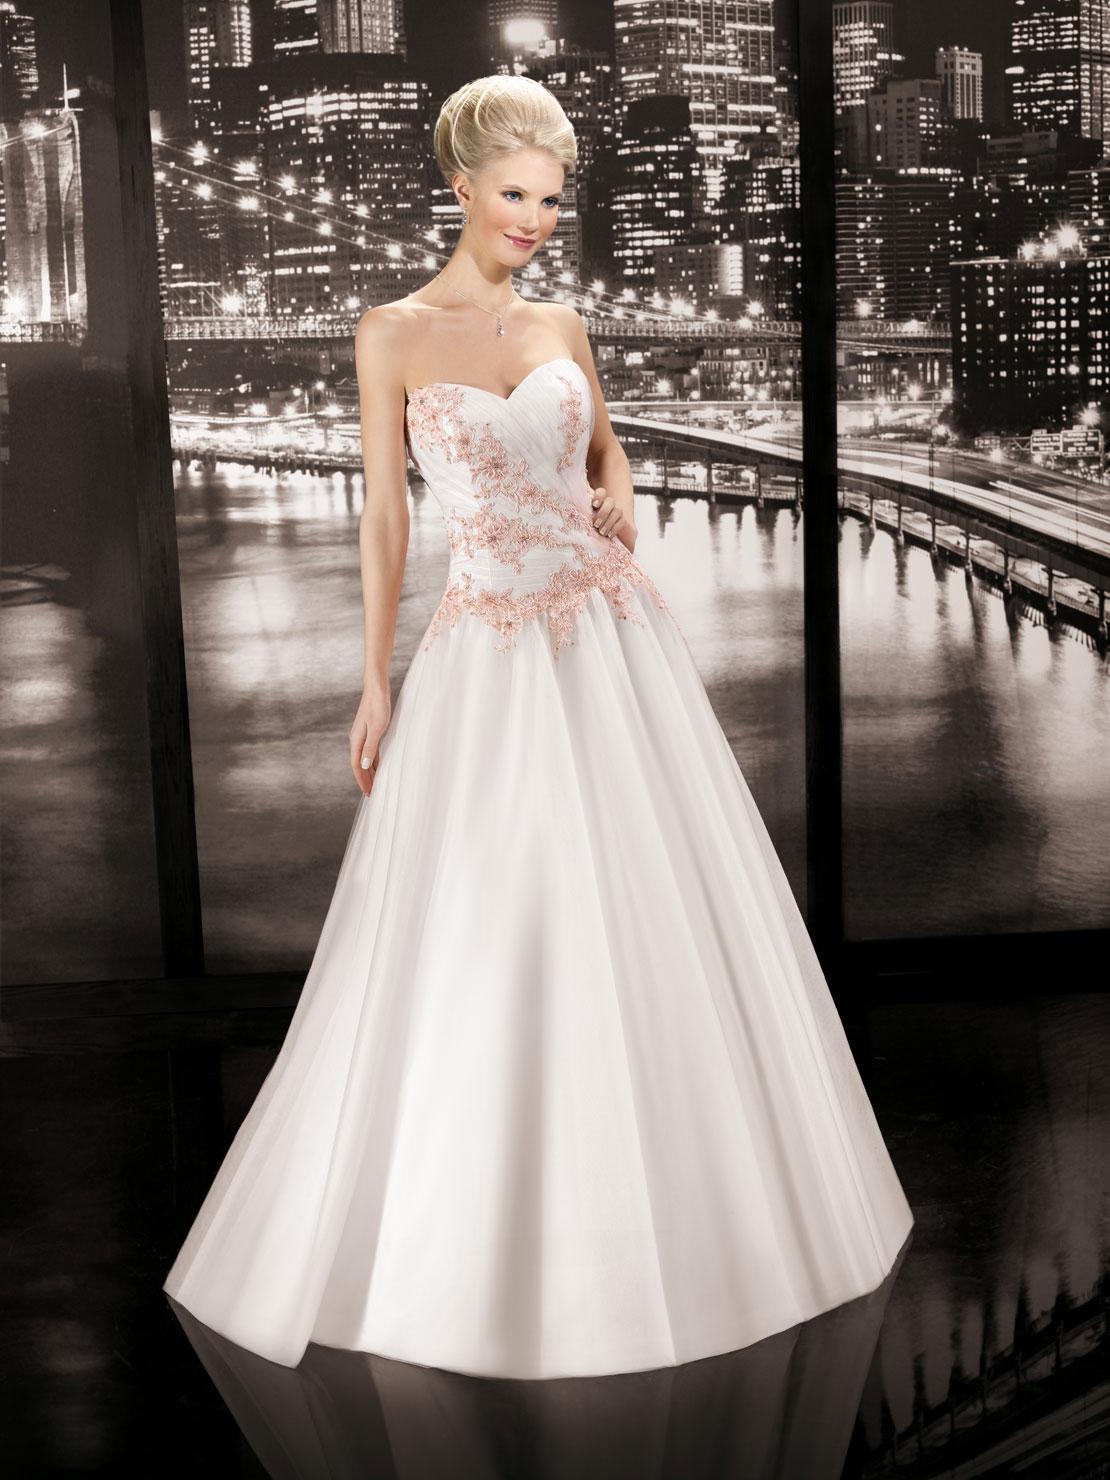 Miss paris 2014 wedding dress 33 the fashionbrides for Wedding dresses in paris france